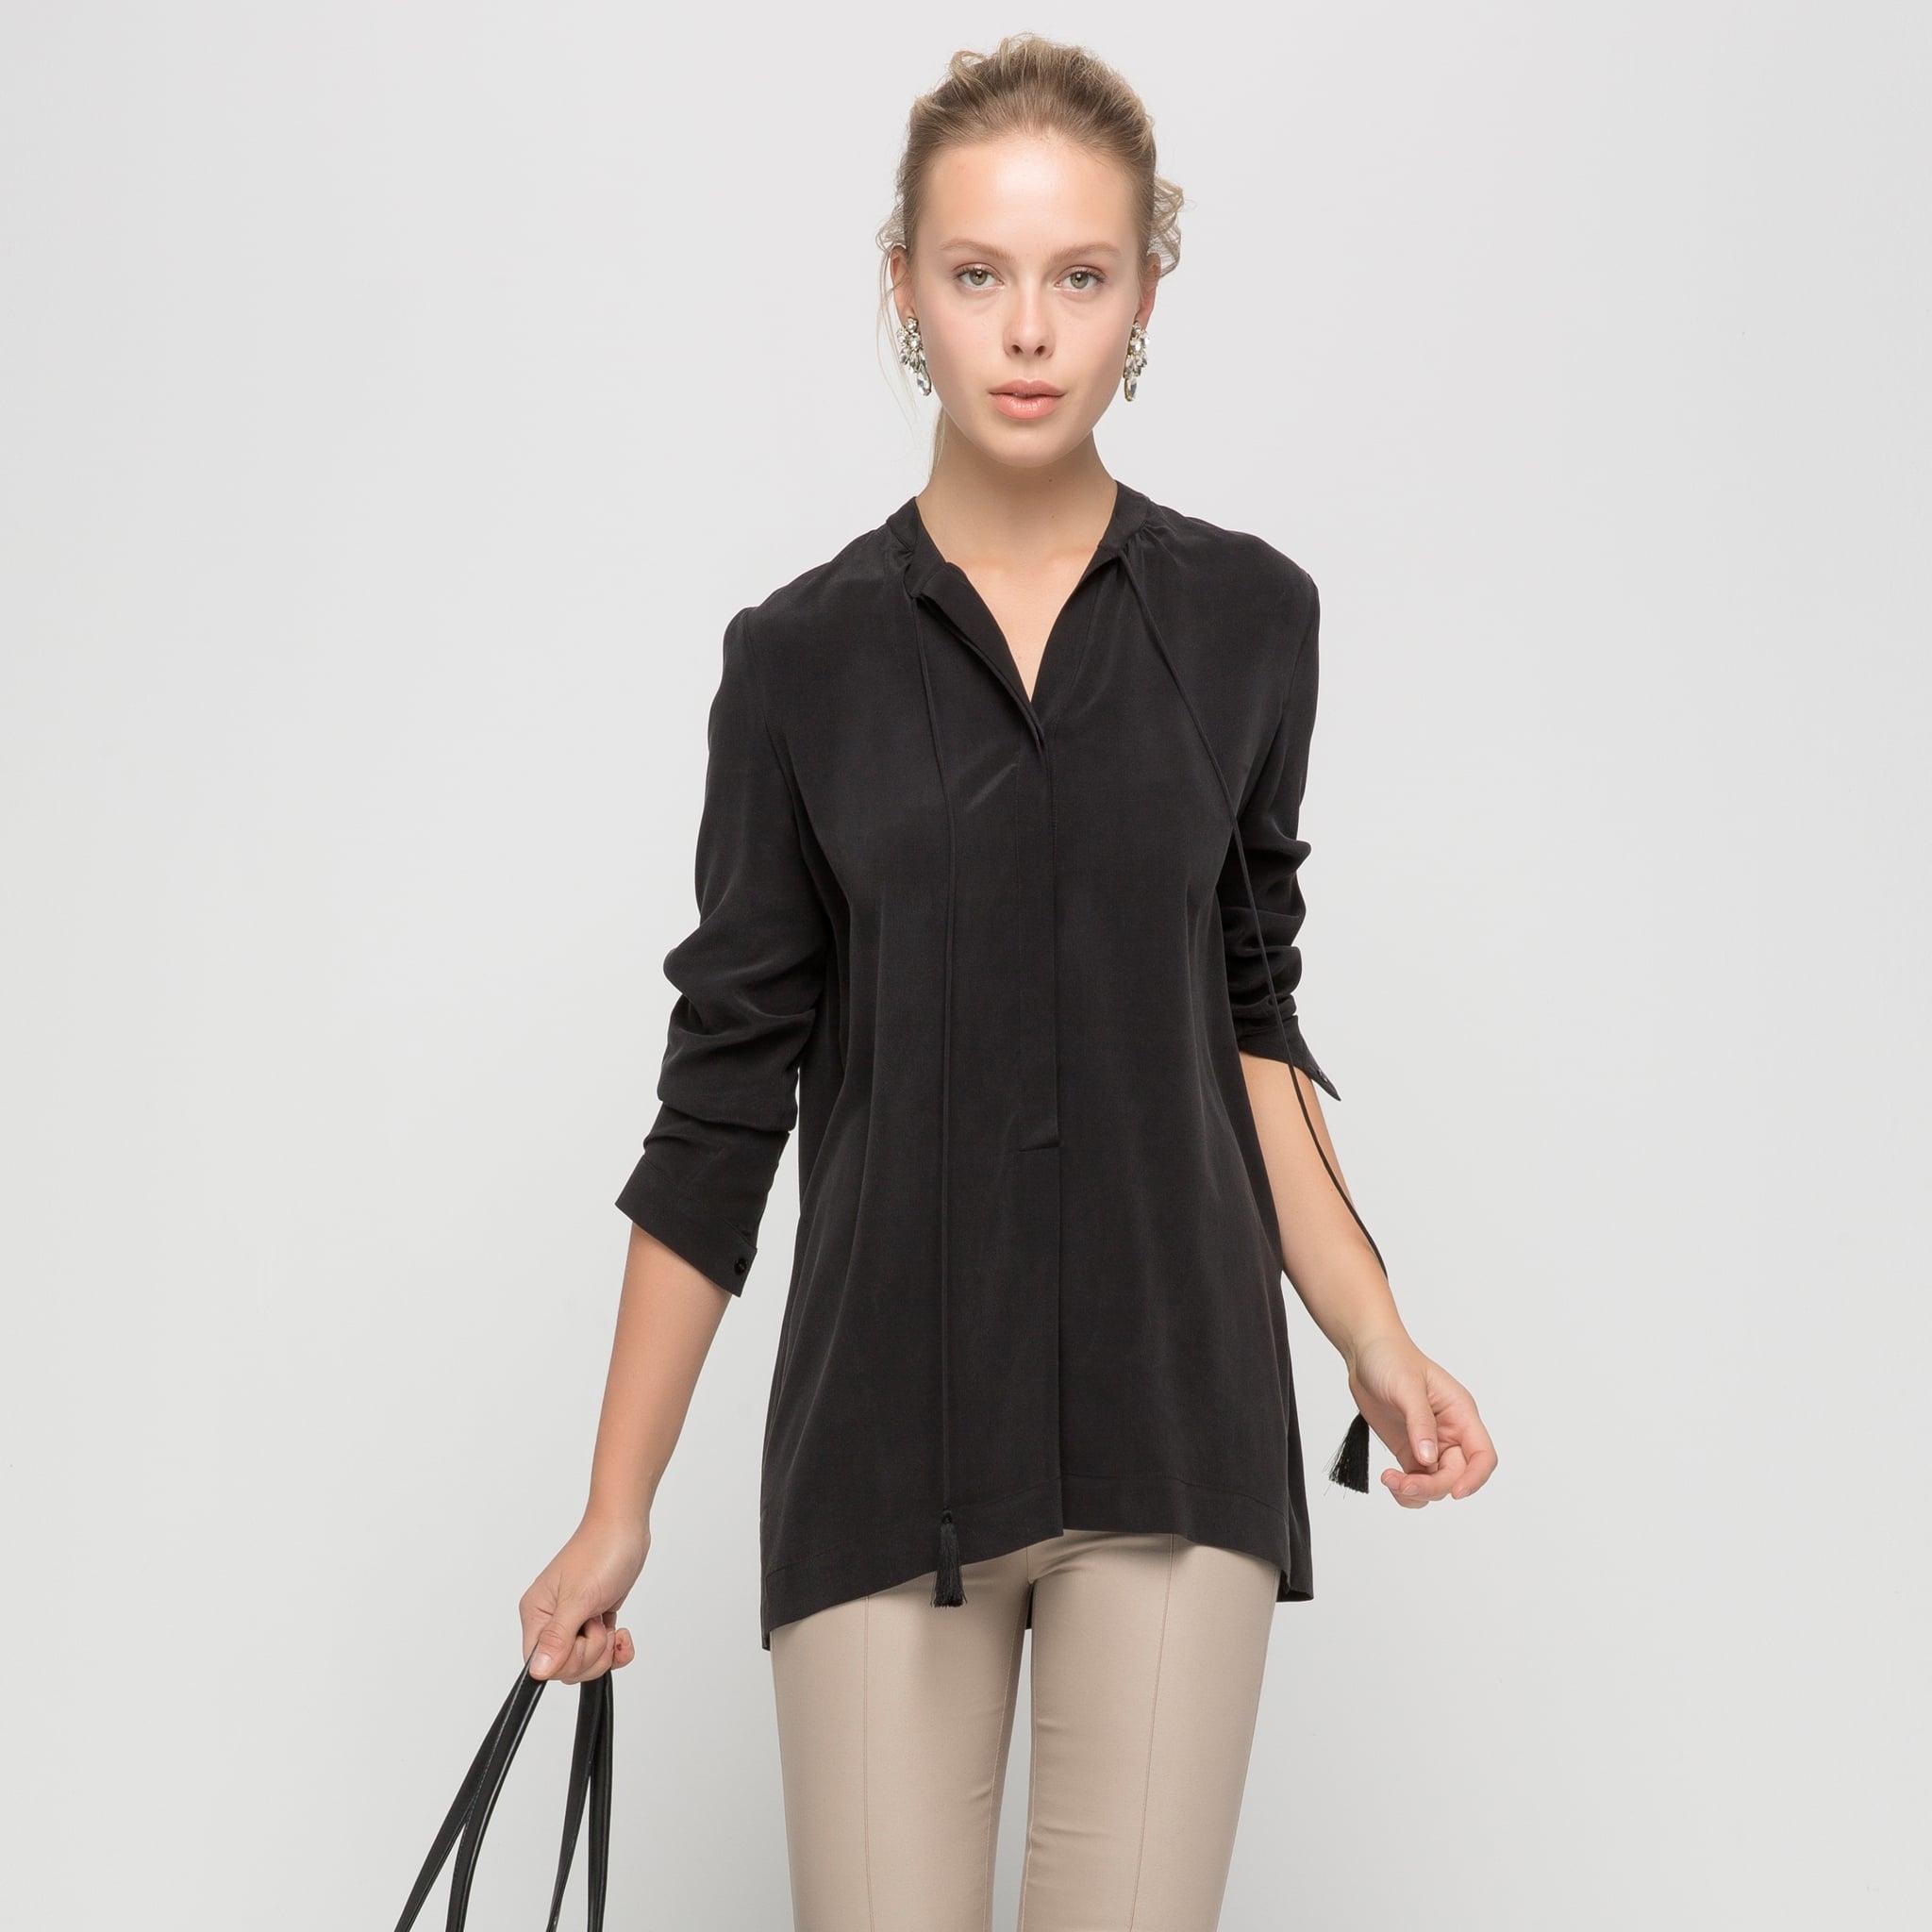 püskül detaylı siyah bluz modeli